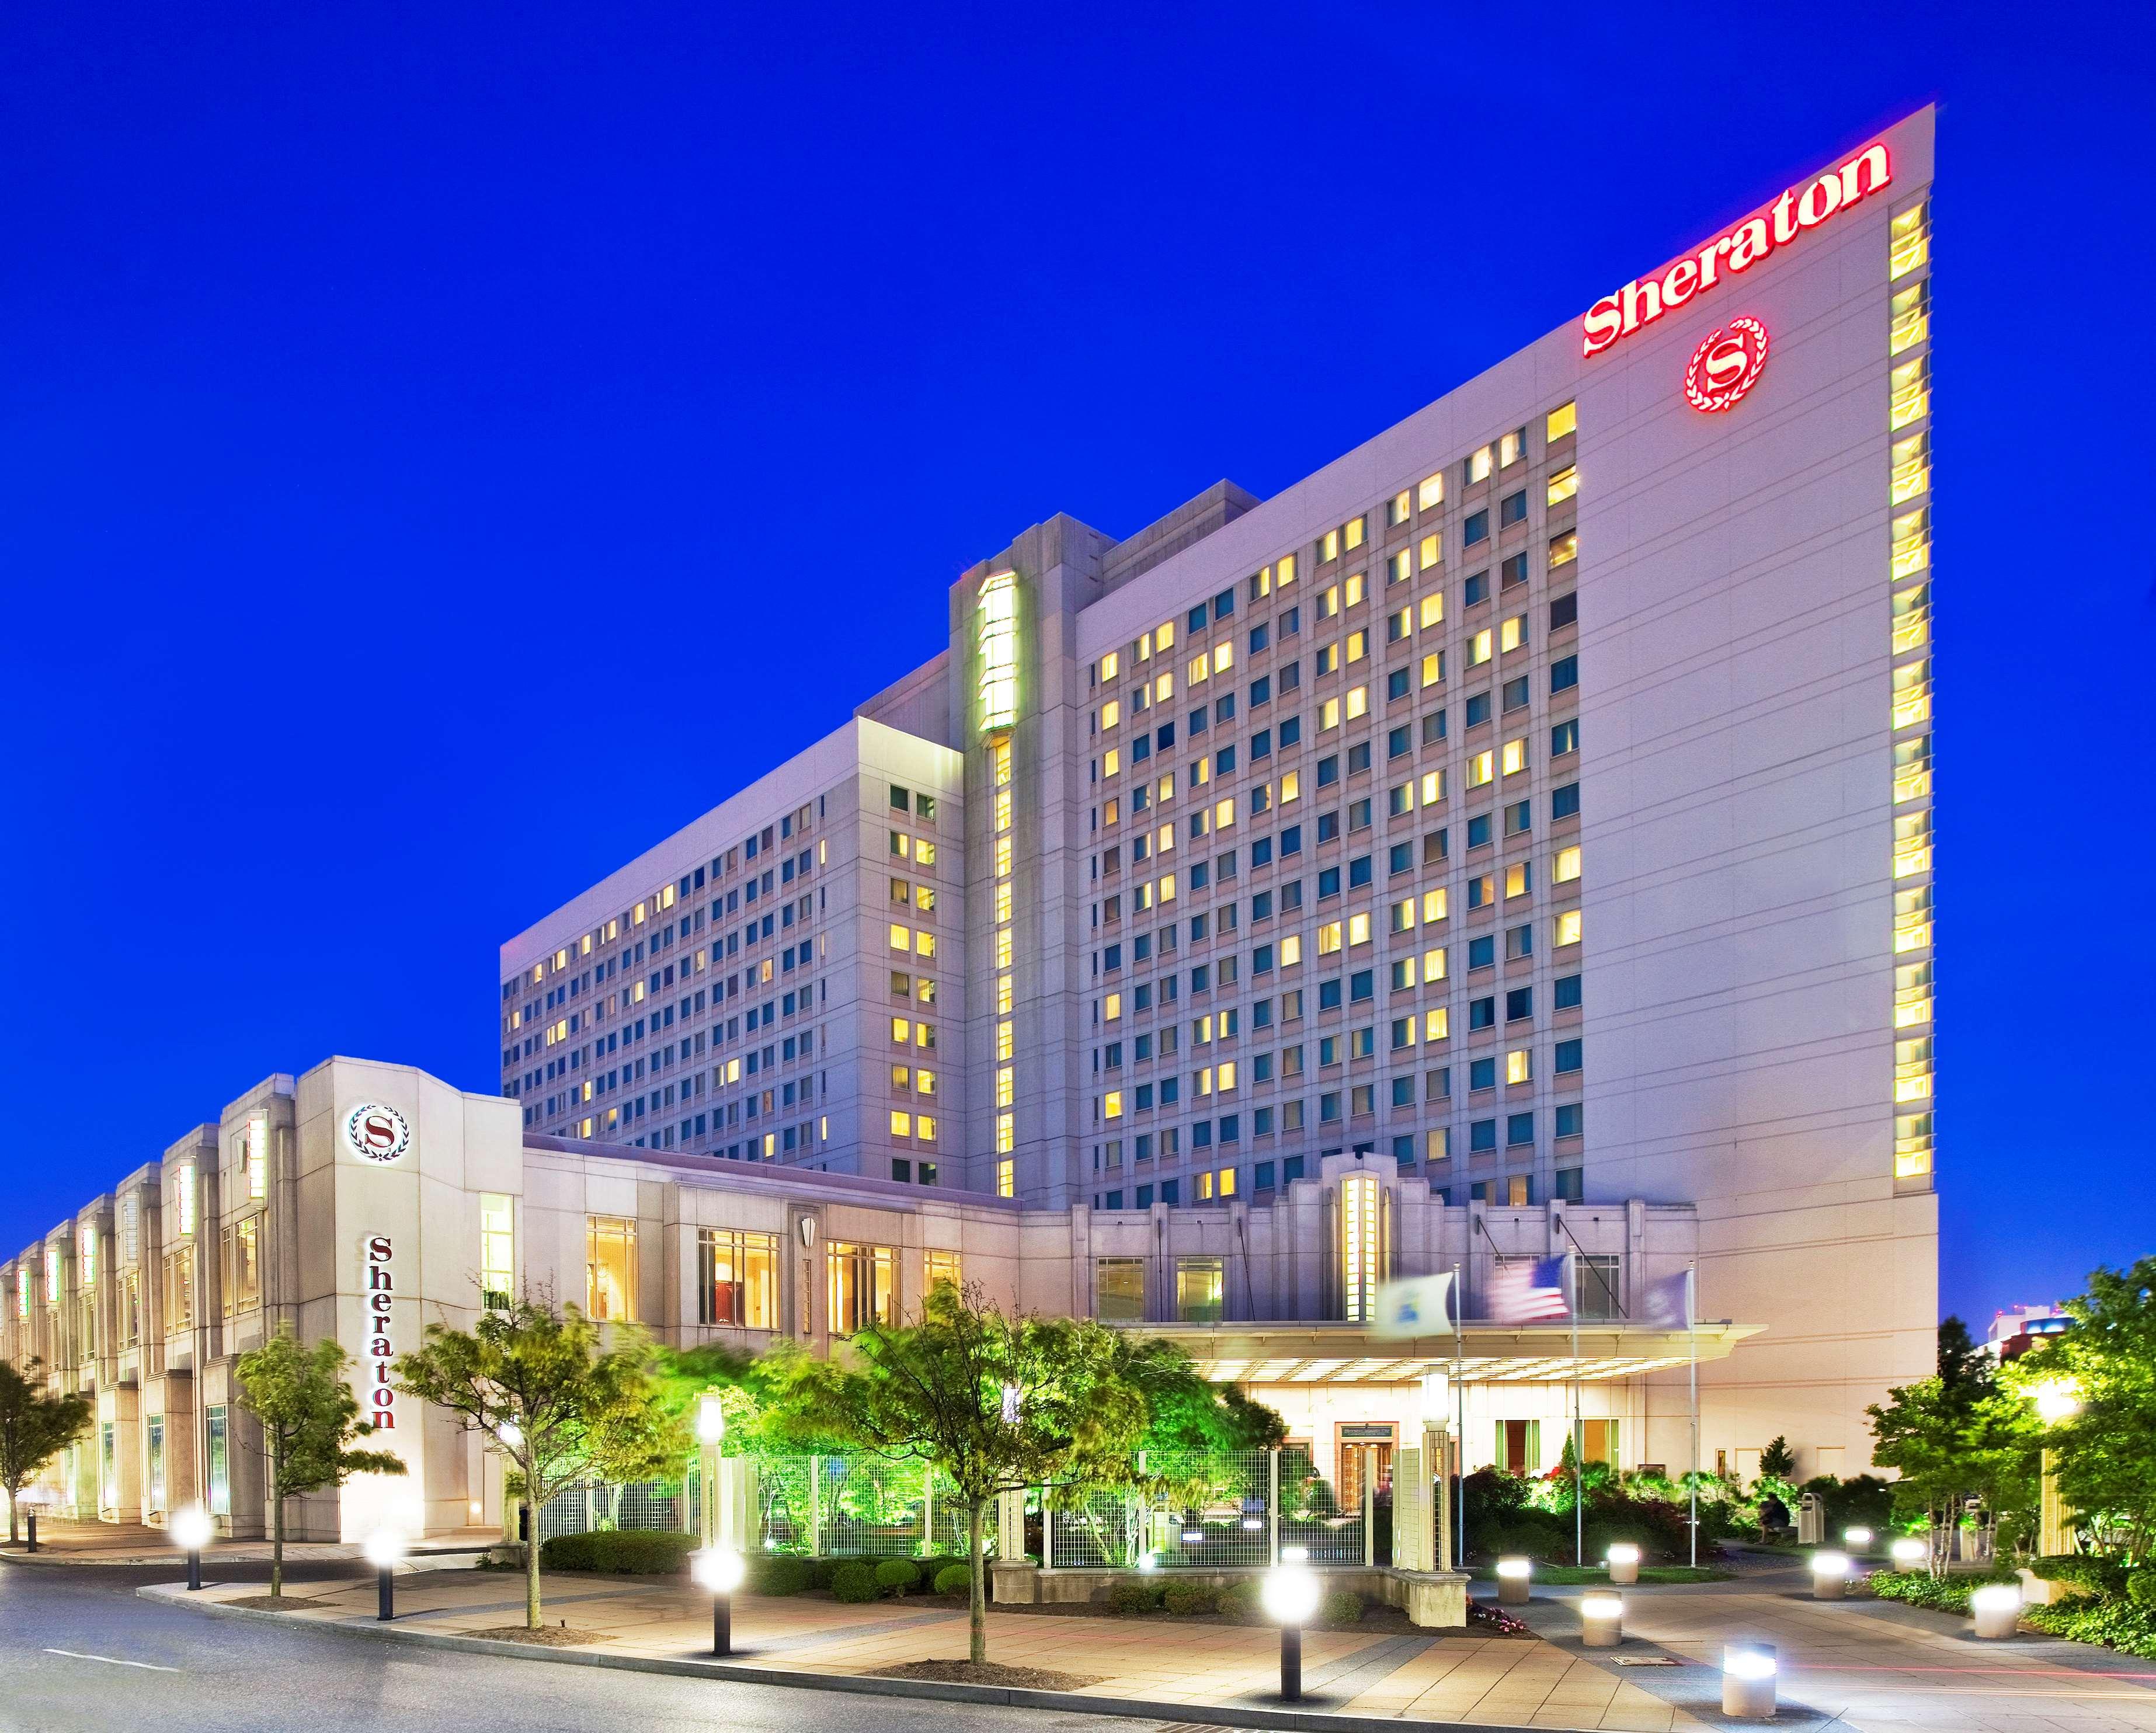 Sheraton Atlantic City Convention Center Hotel image 0